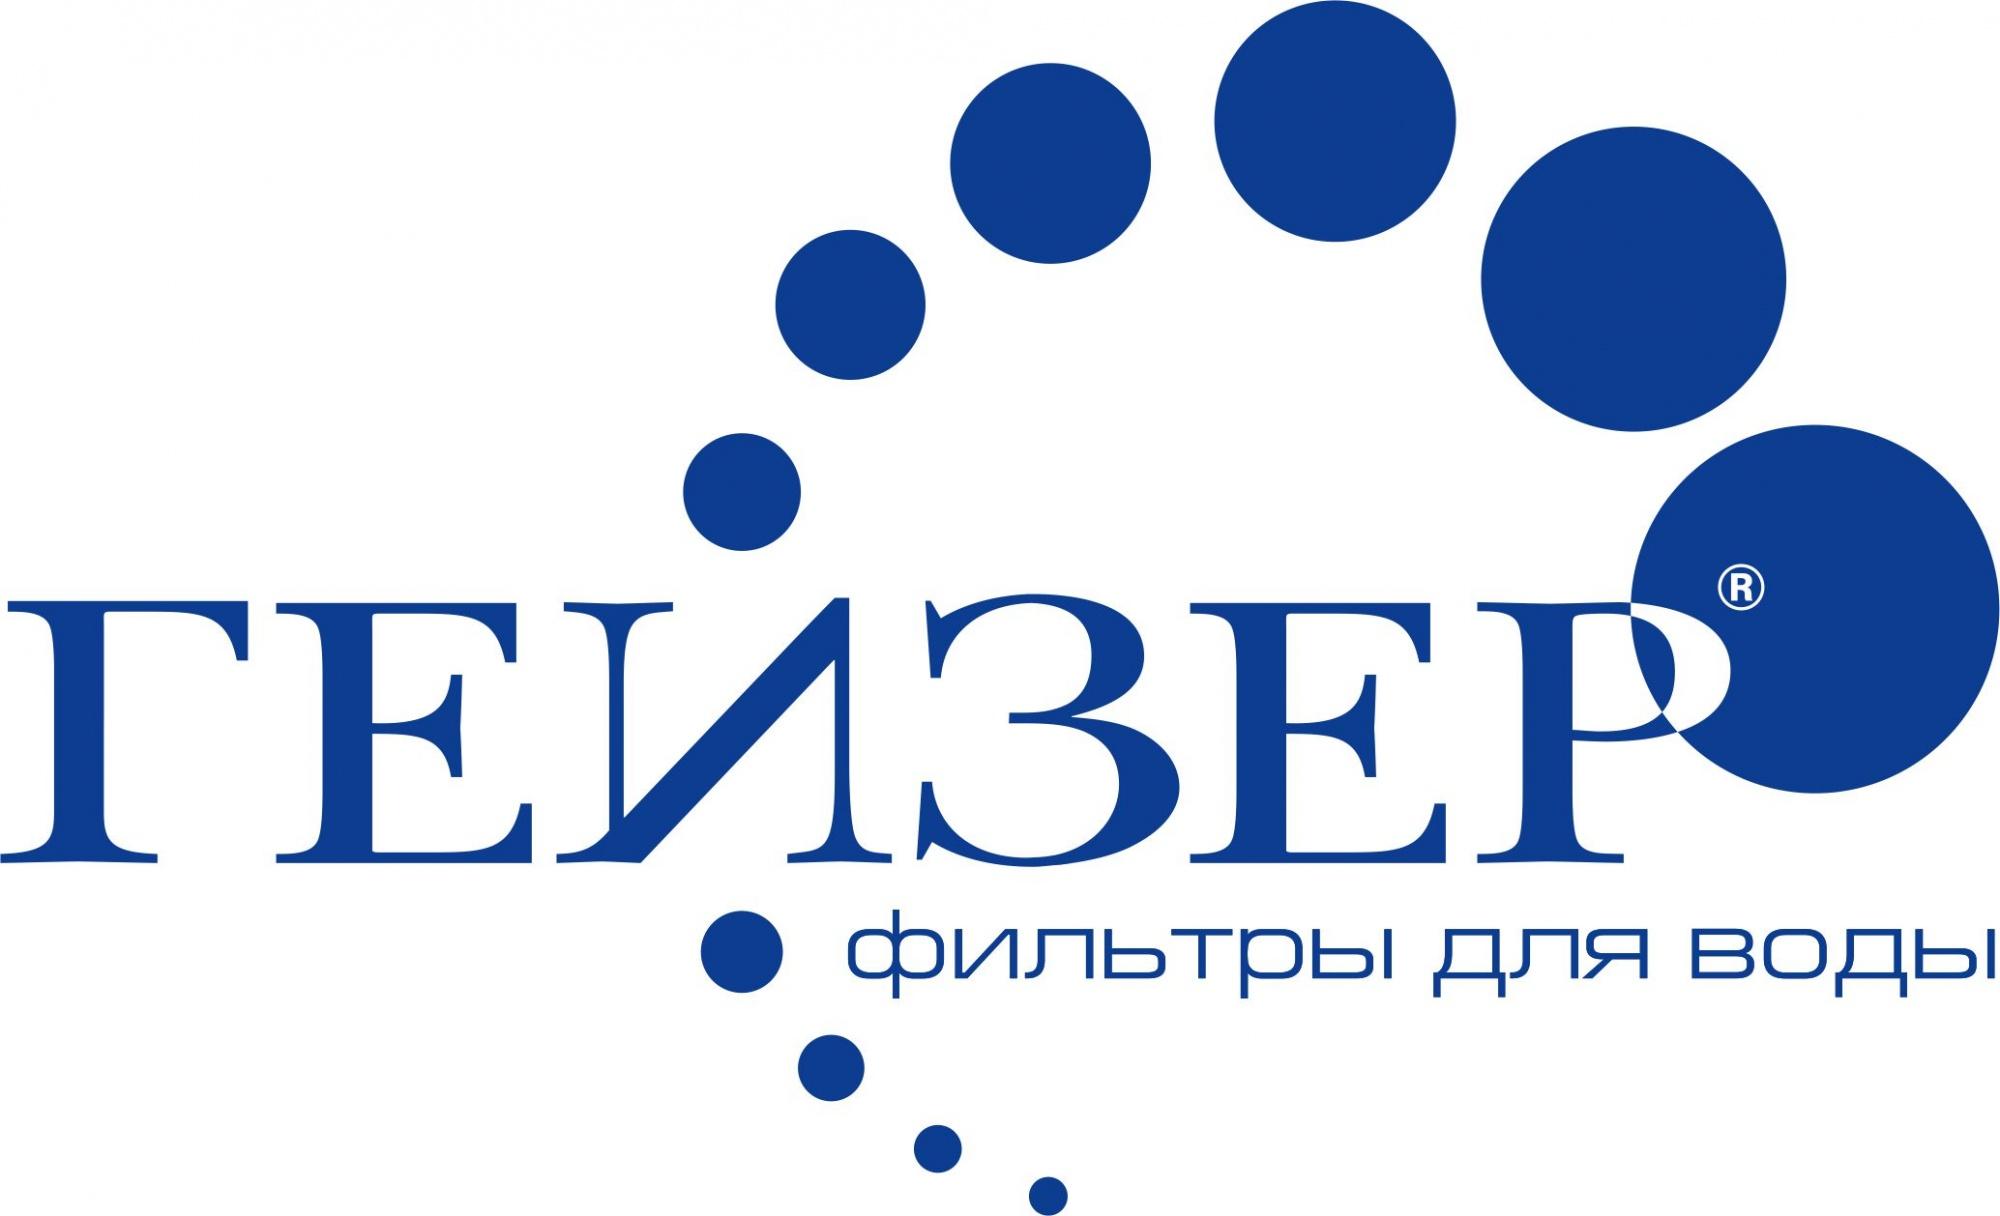 Гейзер логотип